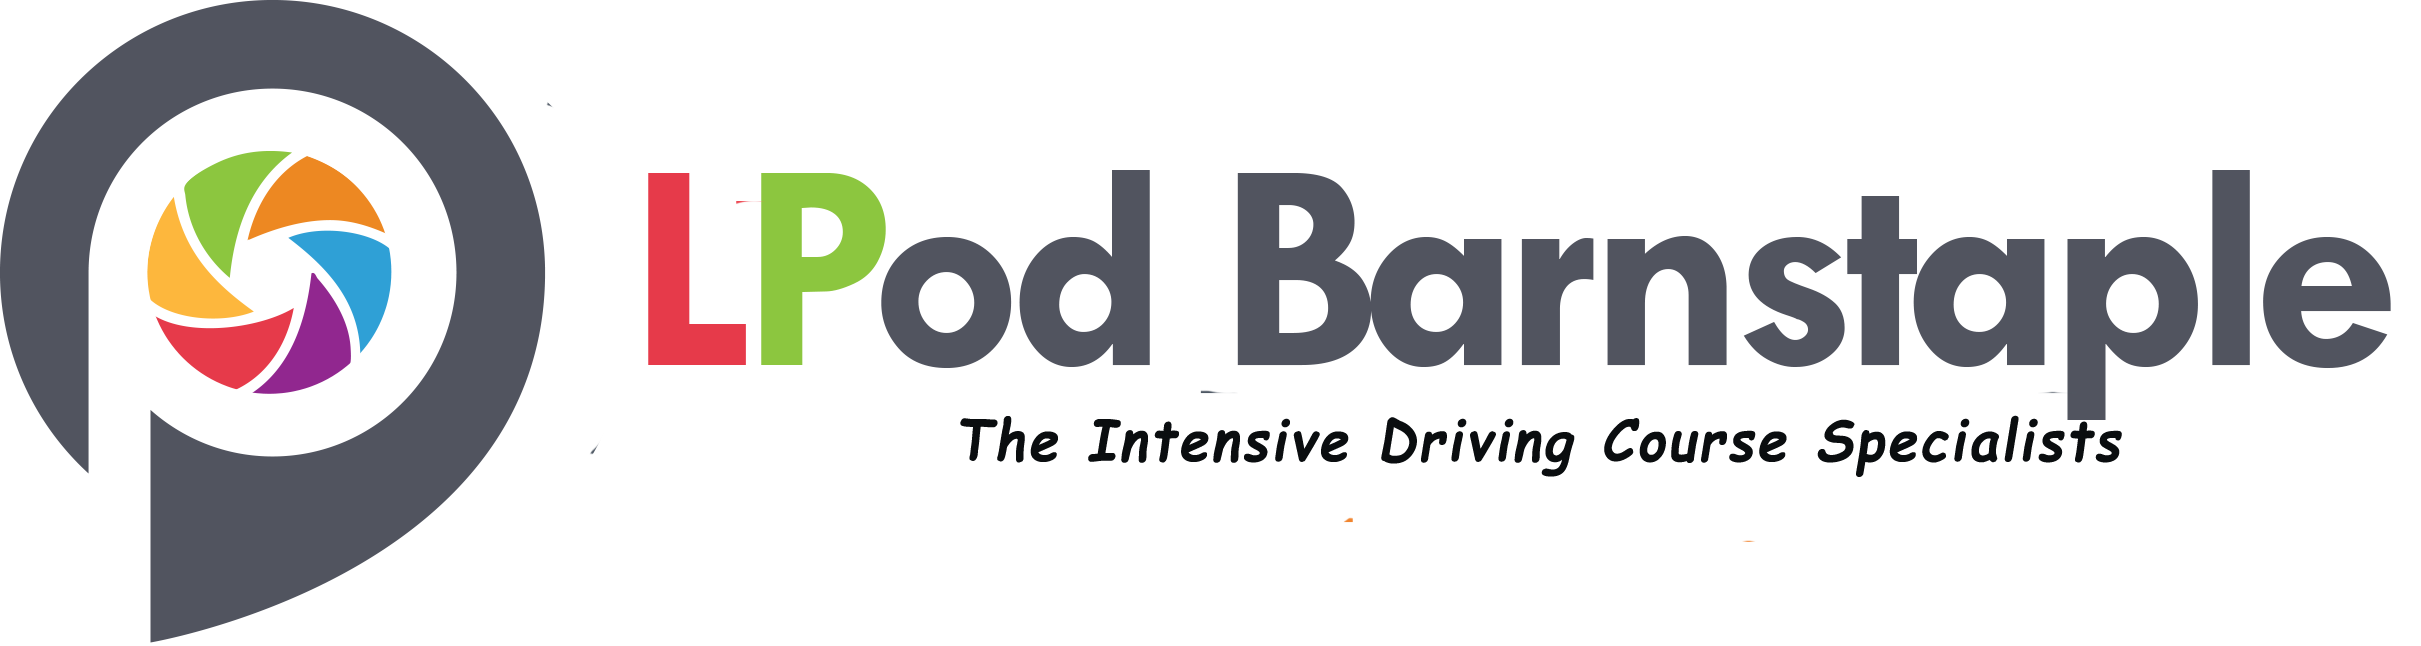 intensive driving courses barnstaple, intensive driving lessons barnstaple, intensive driving school barnstaple